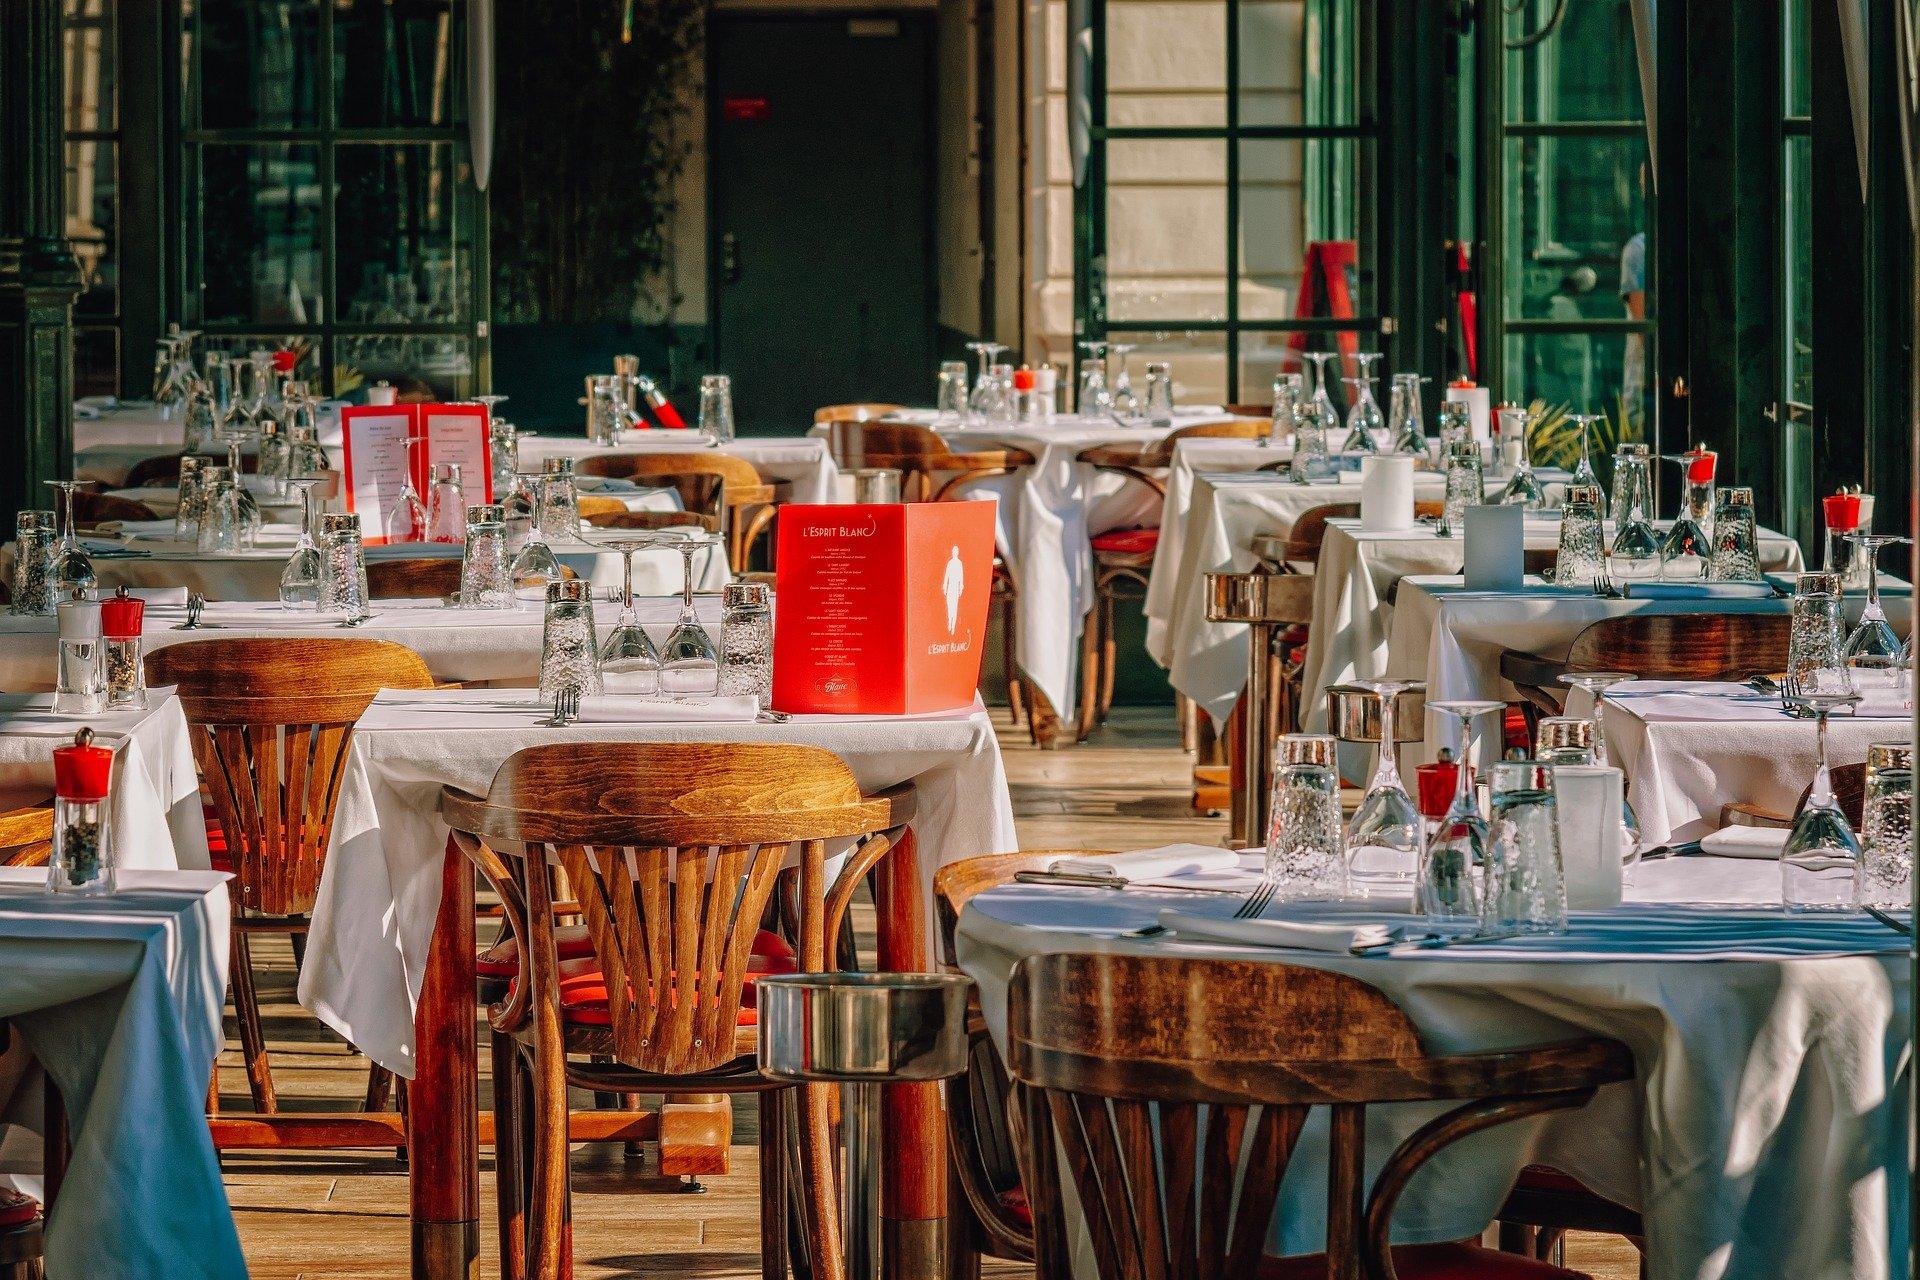 restaurante; mesas